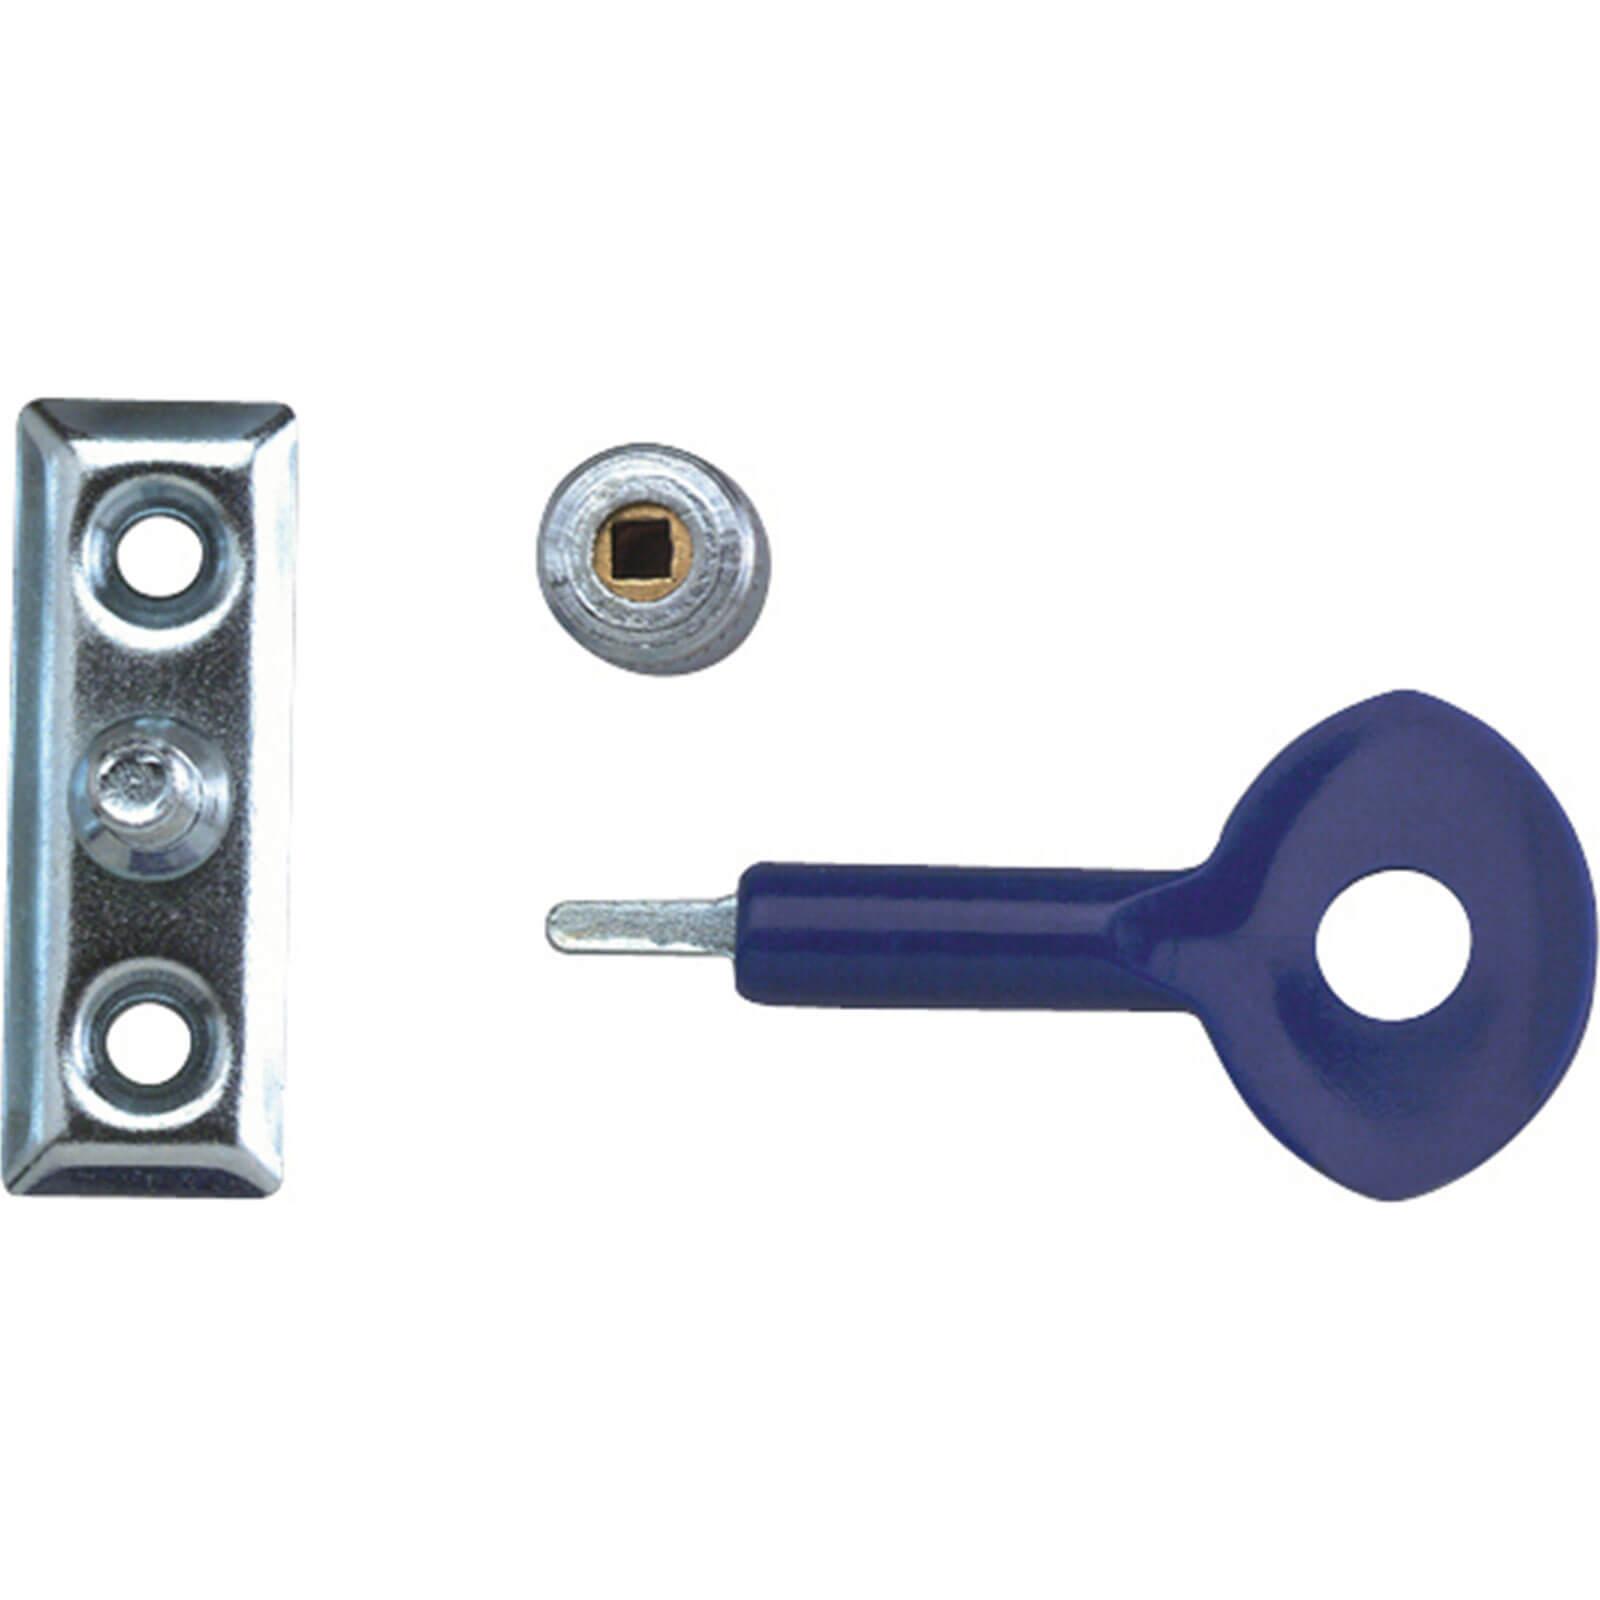 Yale Locks P111 Window Staylocks Polished Brass Finish Pack of 6